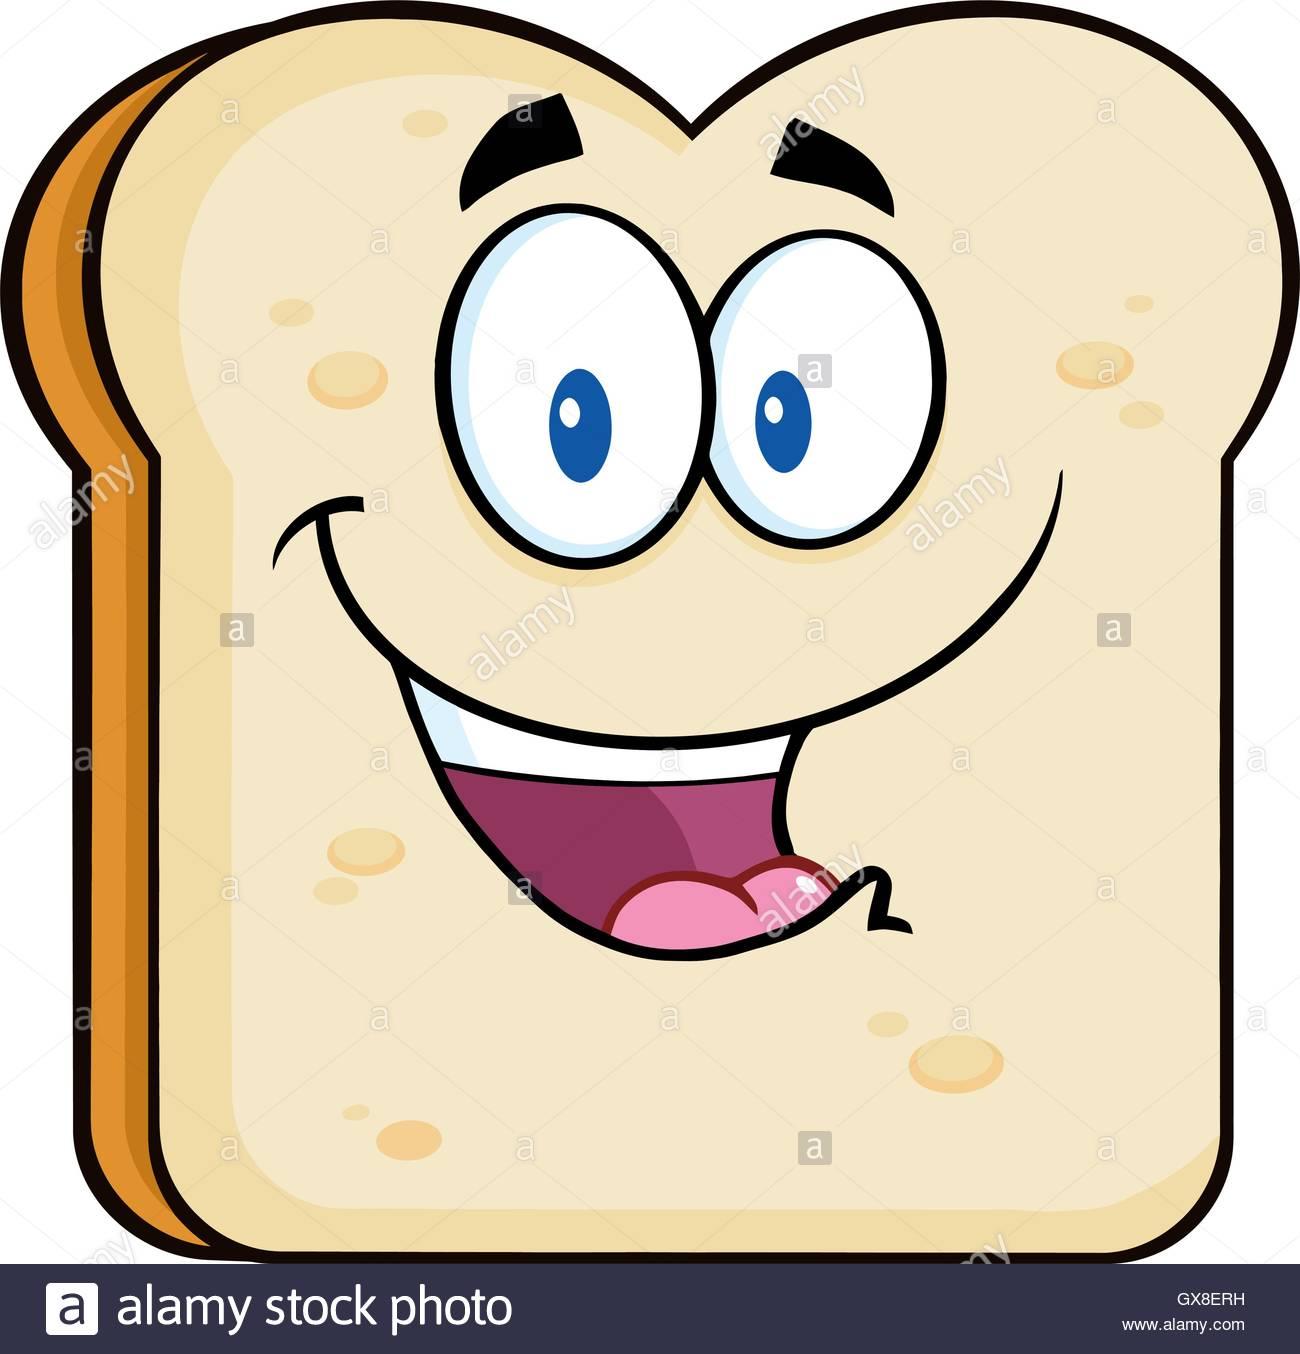 1300x1354 Happy Bread Slice Cartoon Character. Illustration Isolated